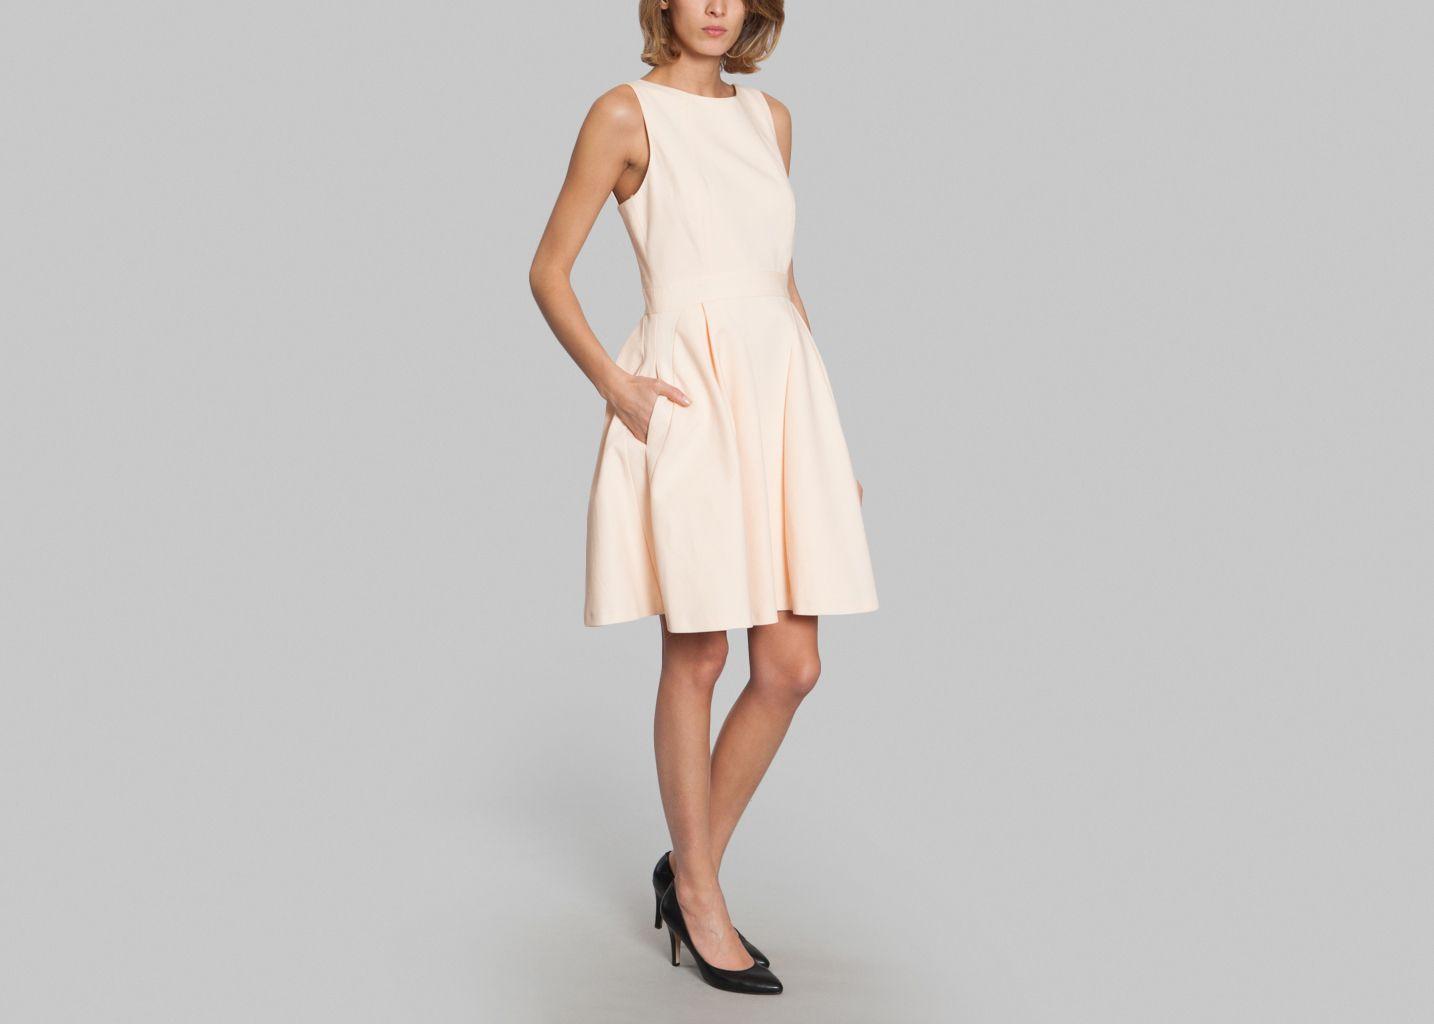 Fabuleux Ottoman Dress Tara Jarmon Peach L'Exception ZA74